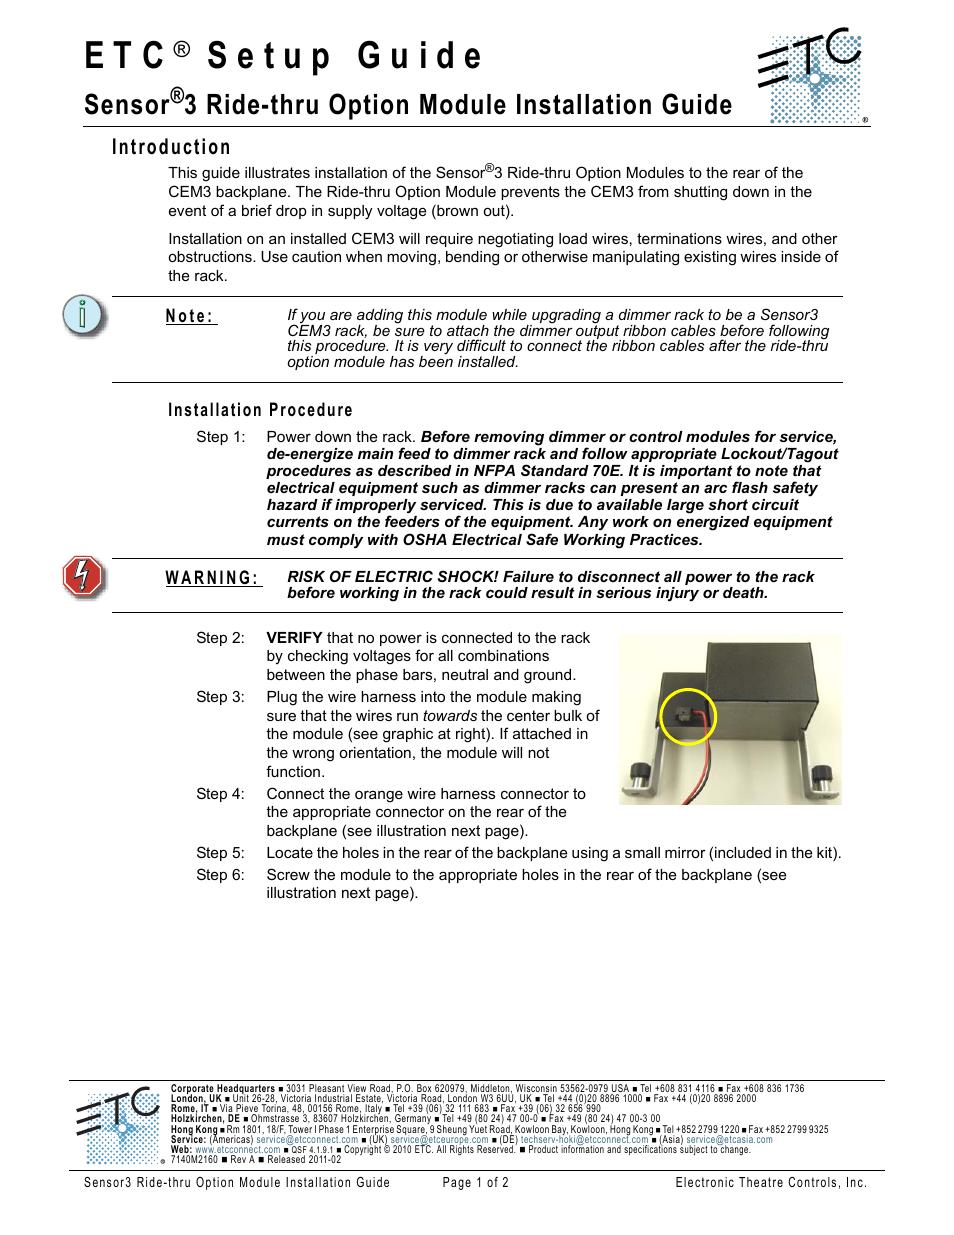 ETC Sensor3 RideThru Option Module User Manual | 2 pages